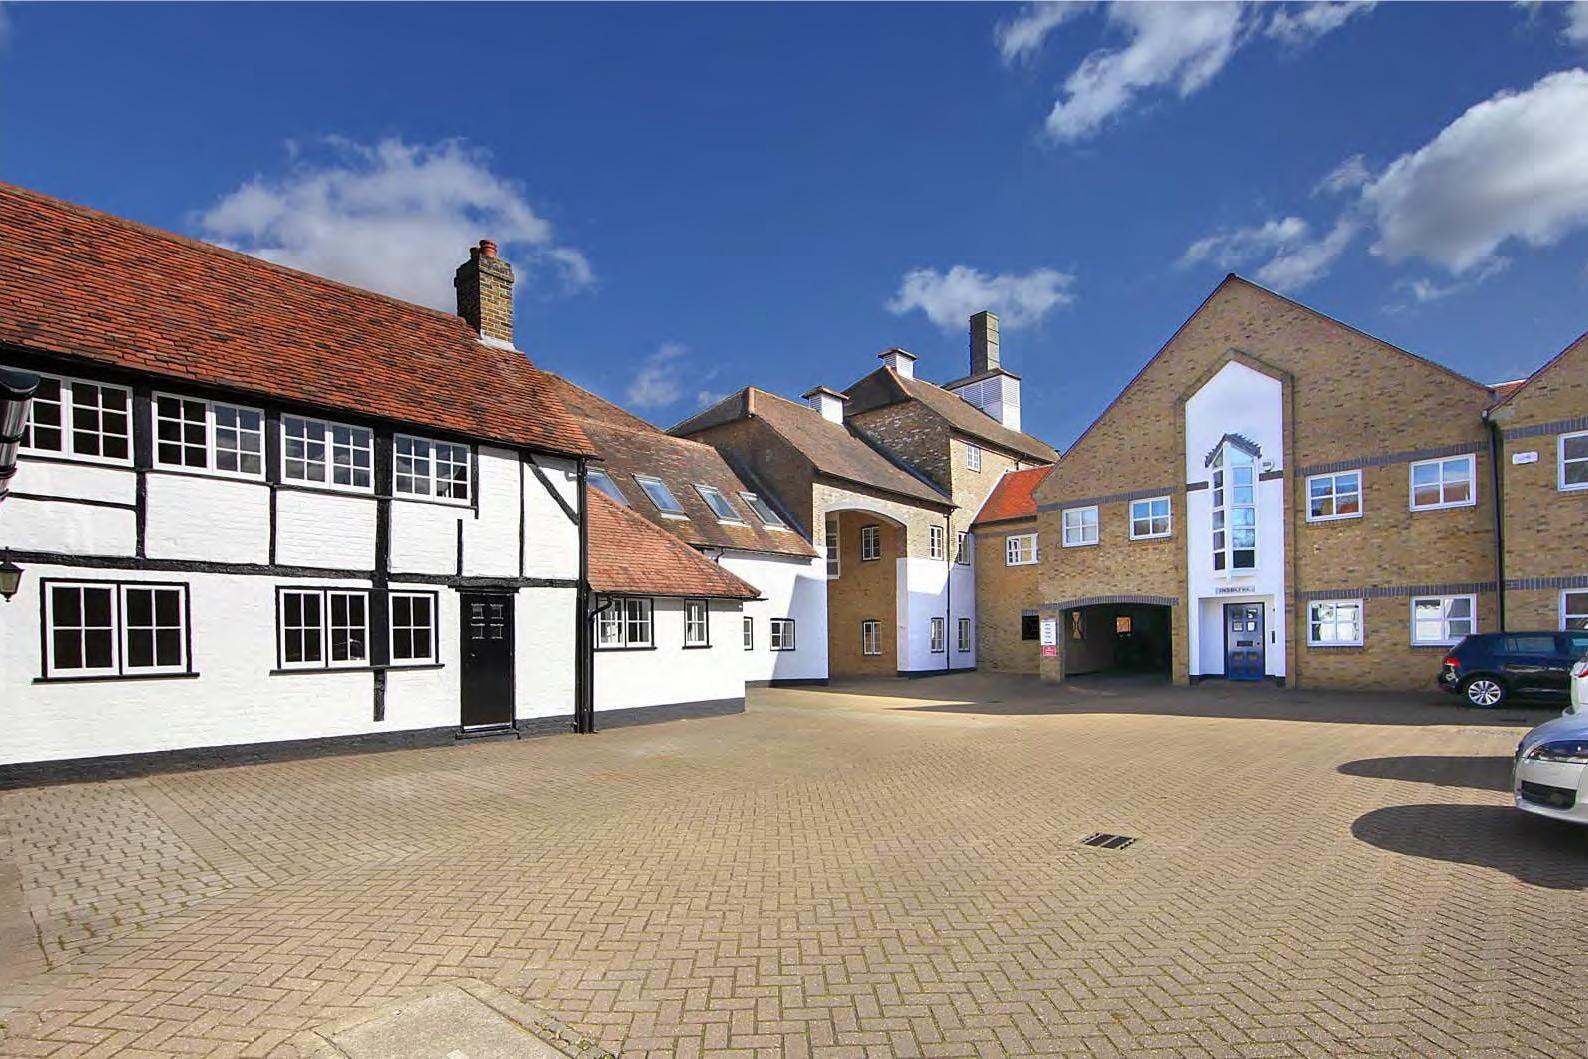 3 Britannia Court, The Green, West Drayton, Development / Residential / Office For Sale - Britannia Court West Drayton courtyard.jpg